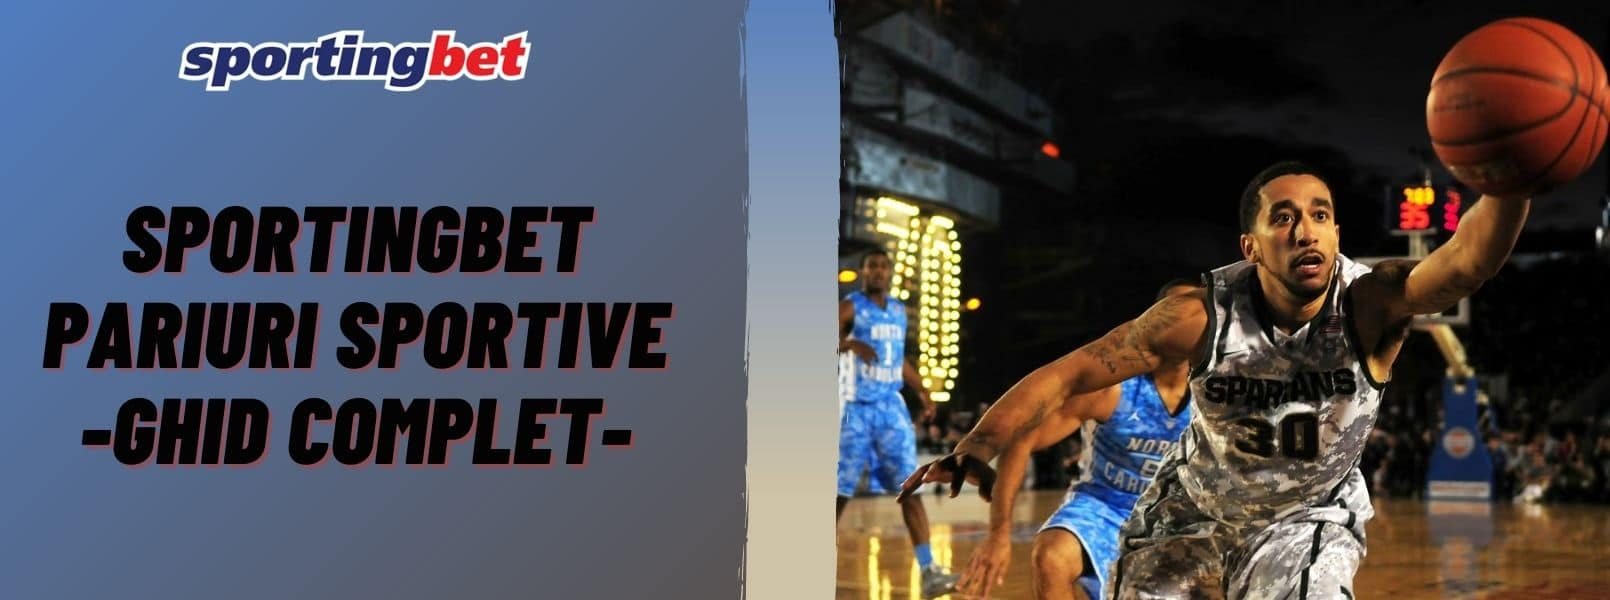 sportingbet pariuri sportive banner